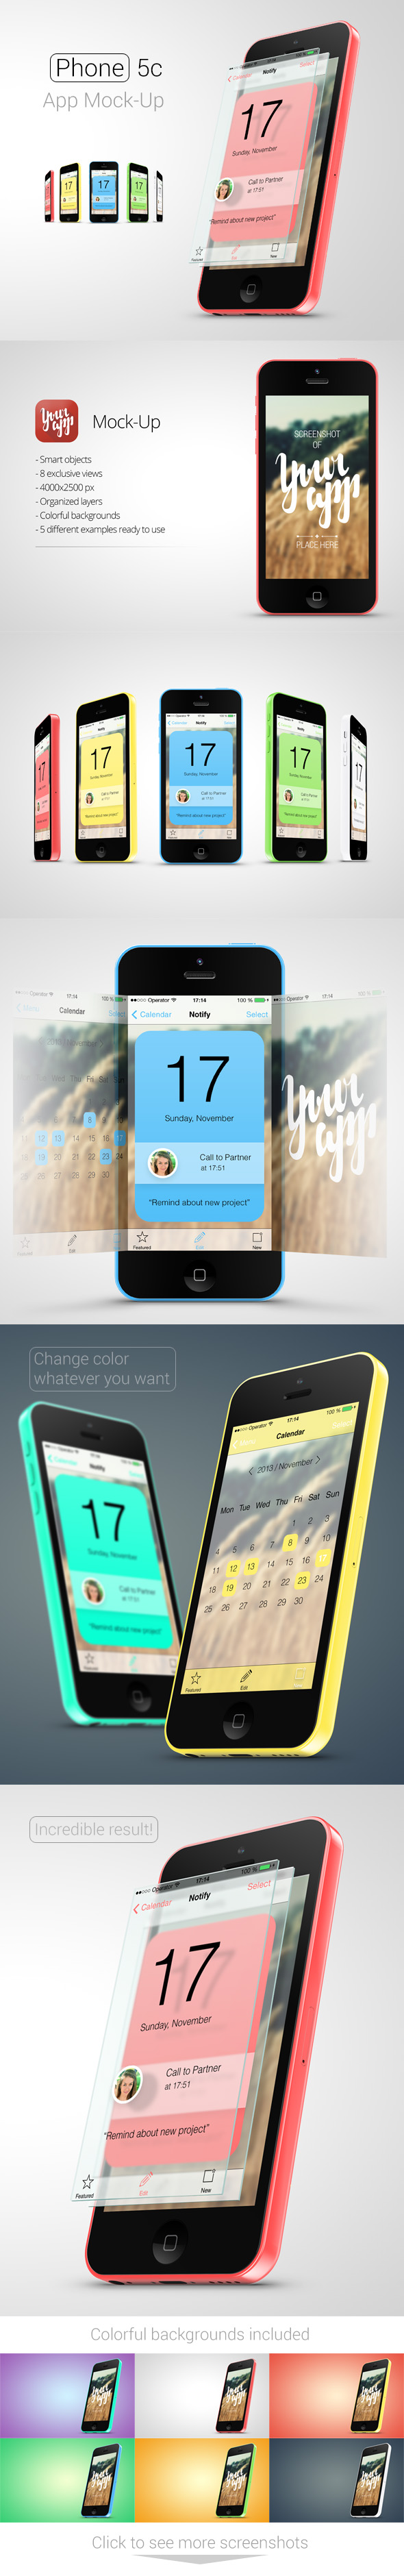 Phone 5c App Mock-Up by kotulsky